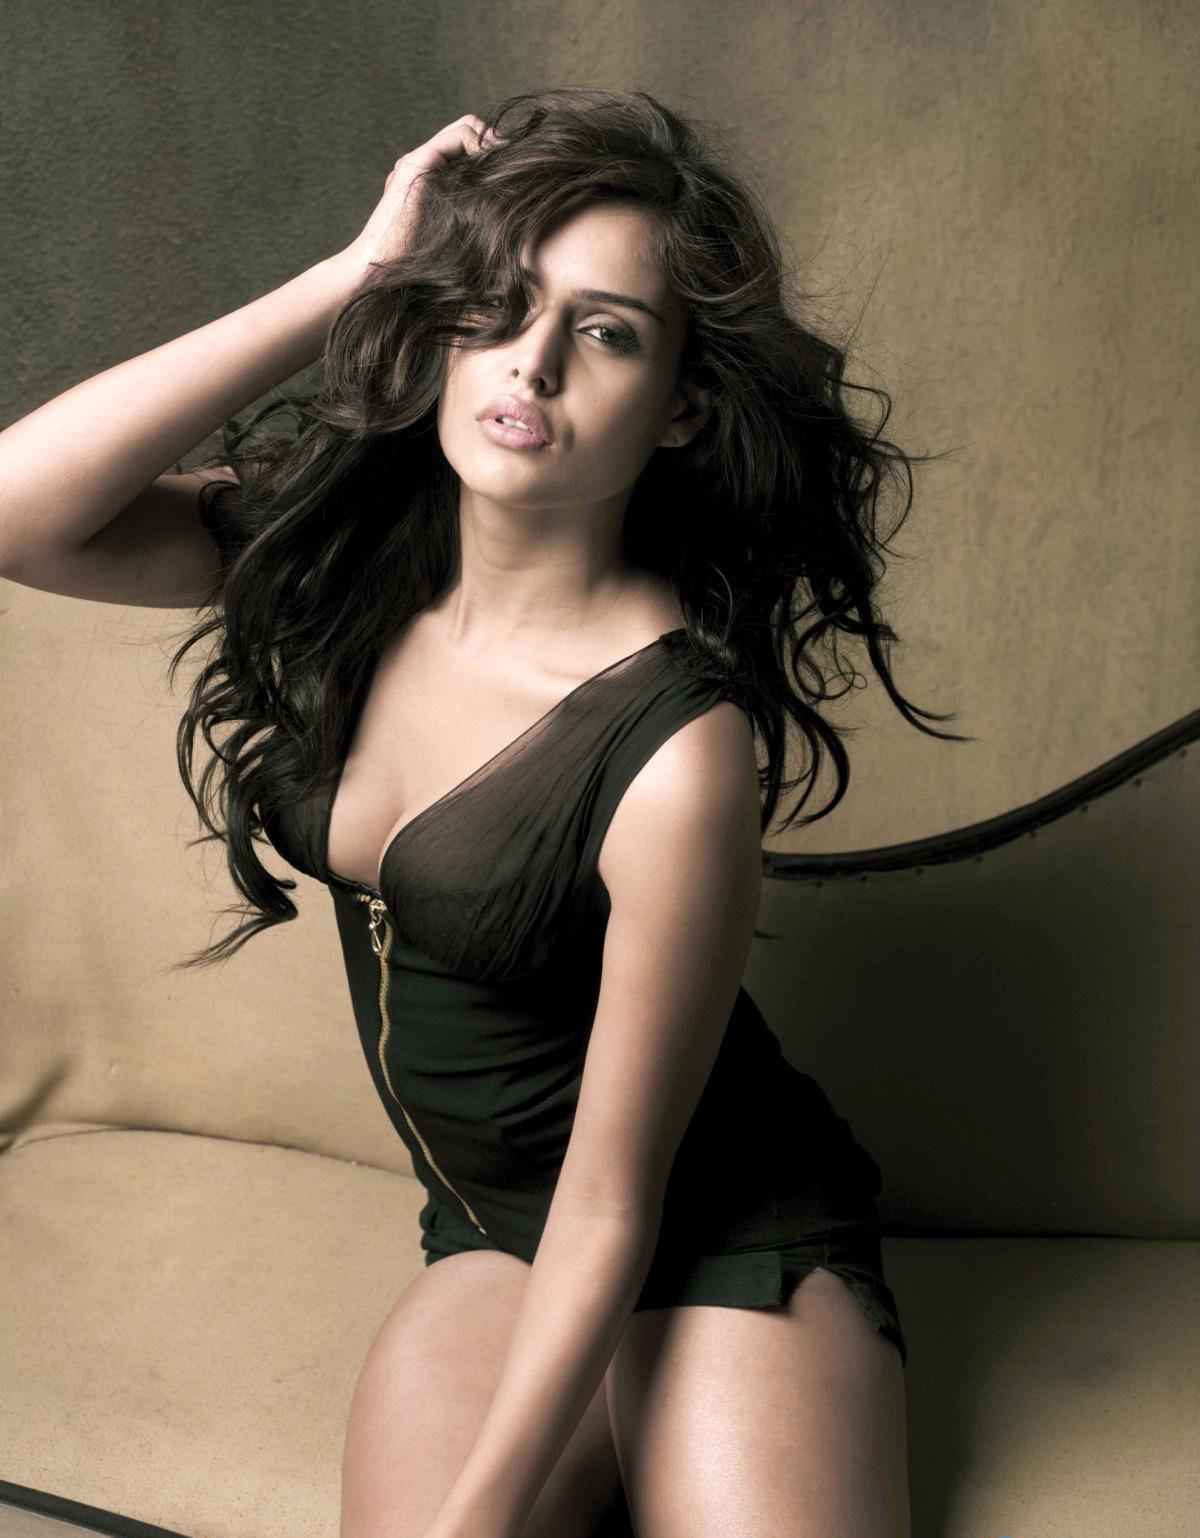 Sexy Is a cute Nathalia Kaur naked photo 2017